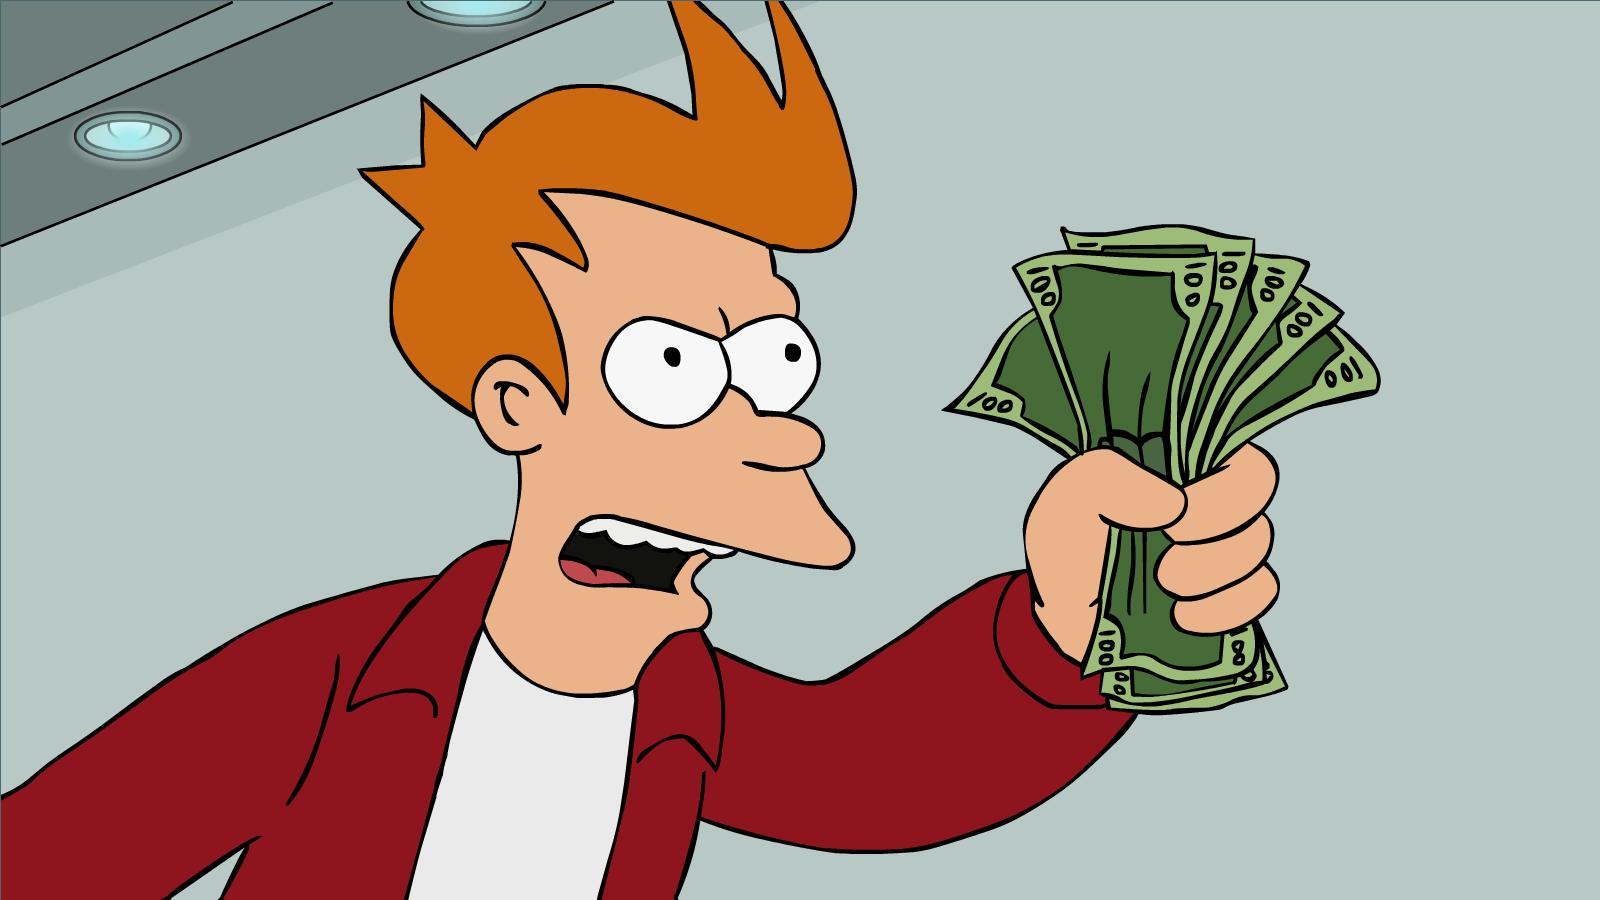 Futurama's Fry demands that someone take his money